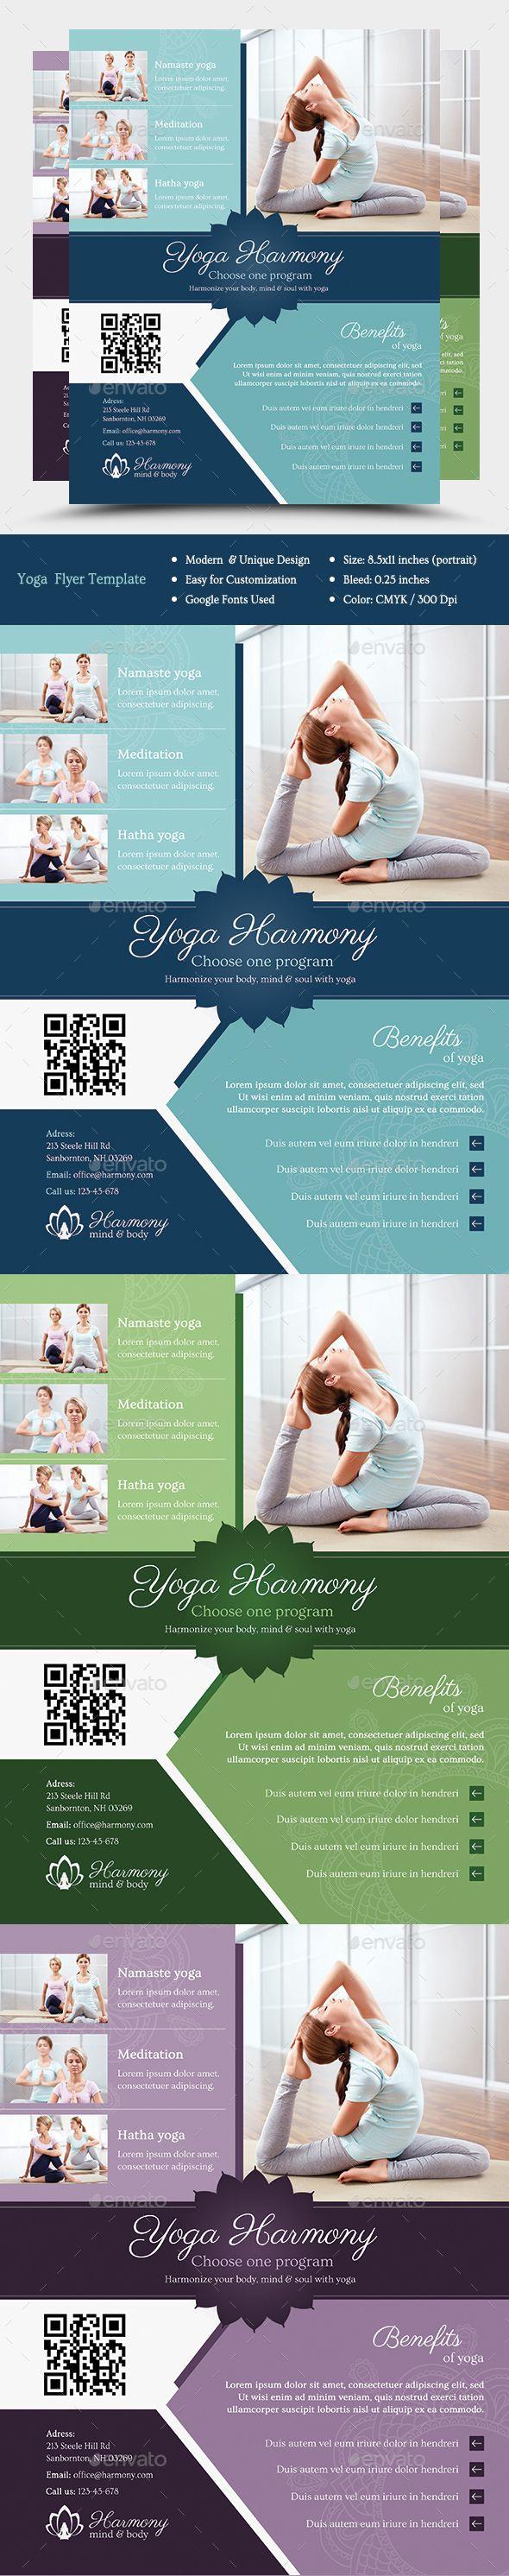 Harmony Yoga Flyer Template